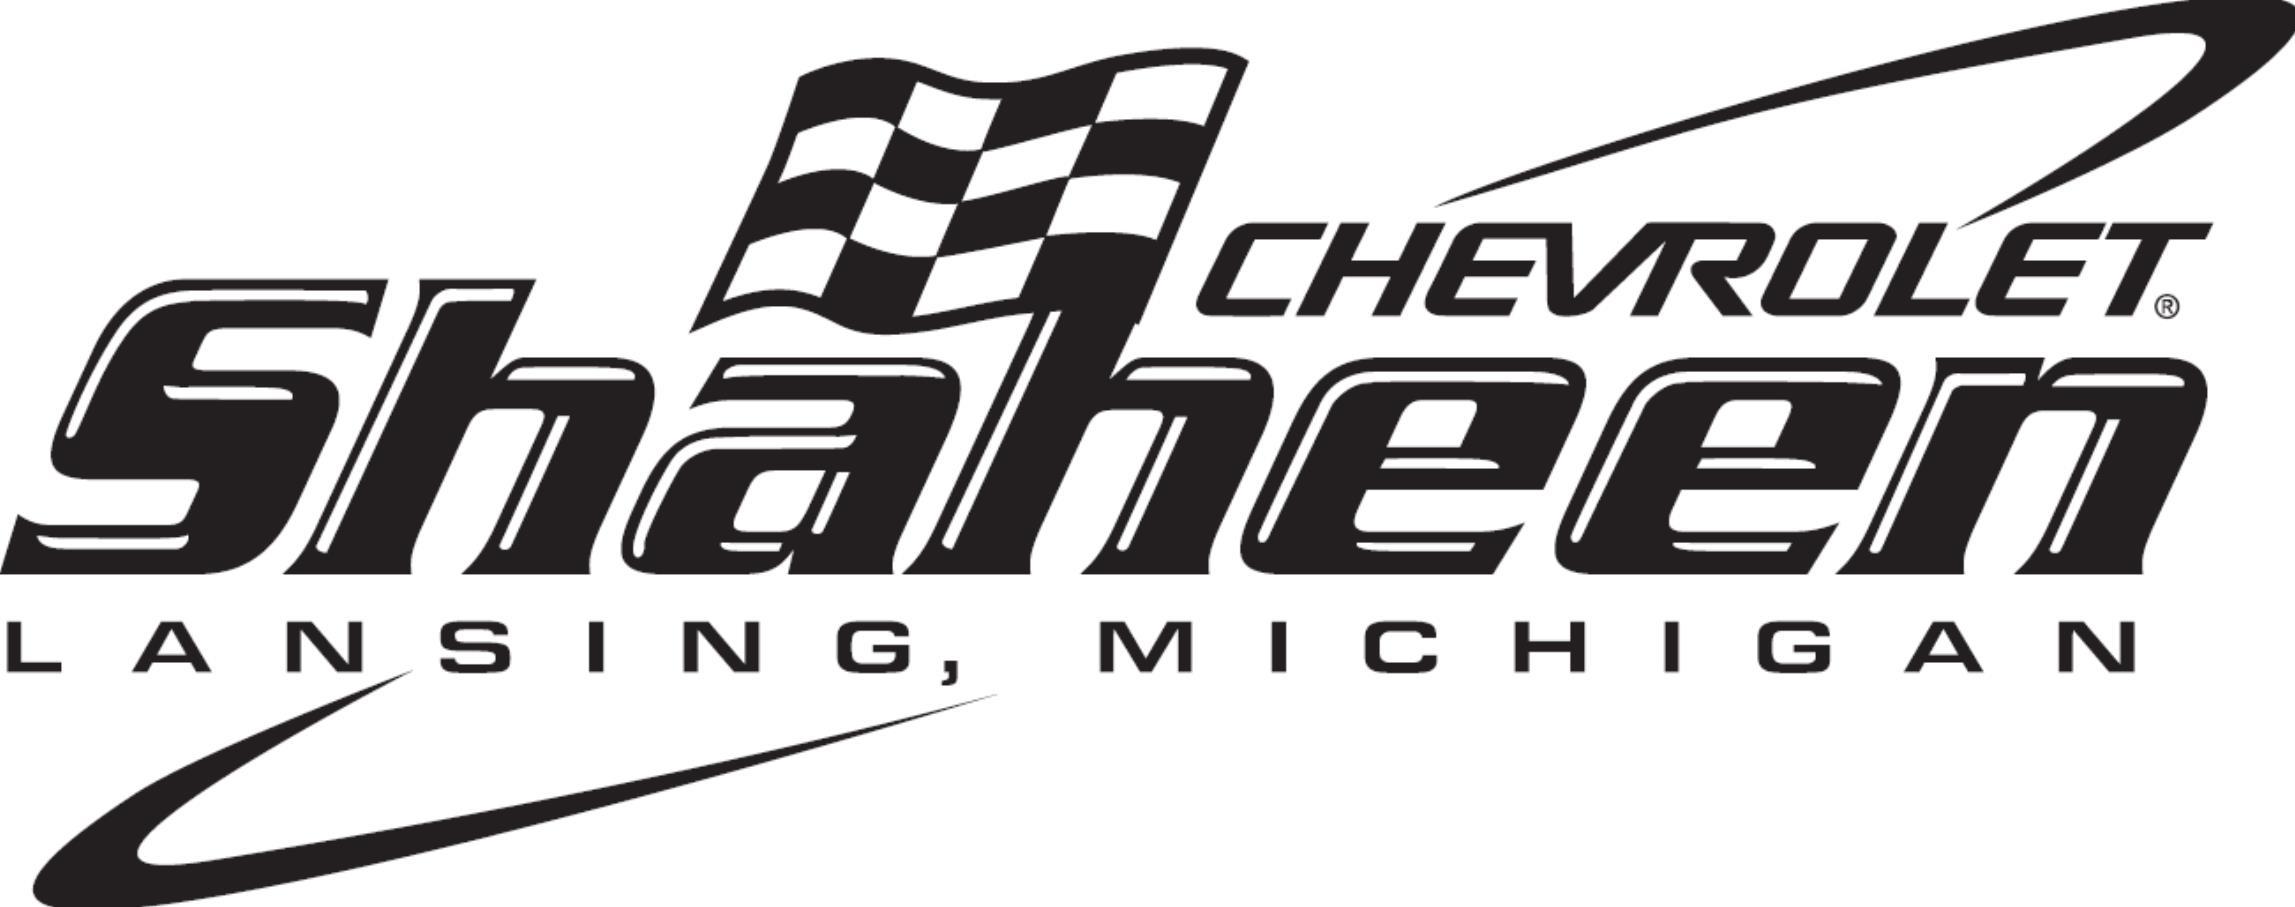 www.shaheenlansing.com/